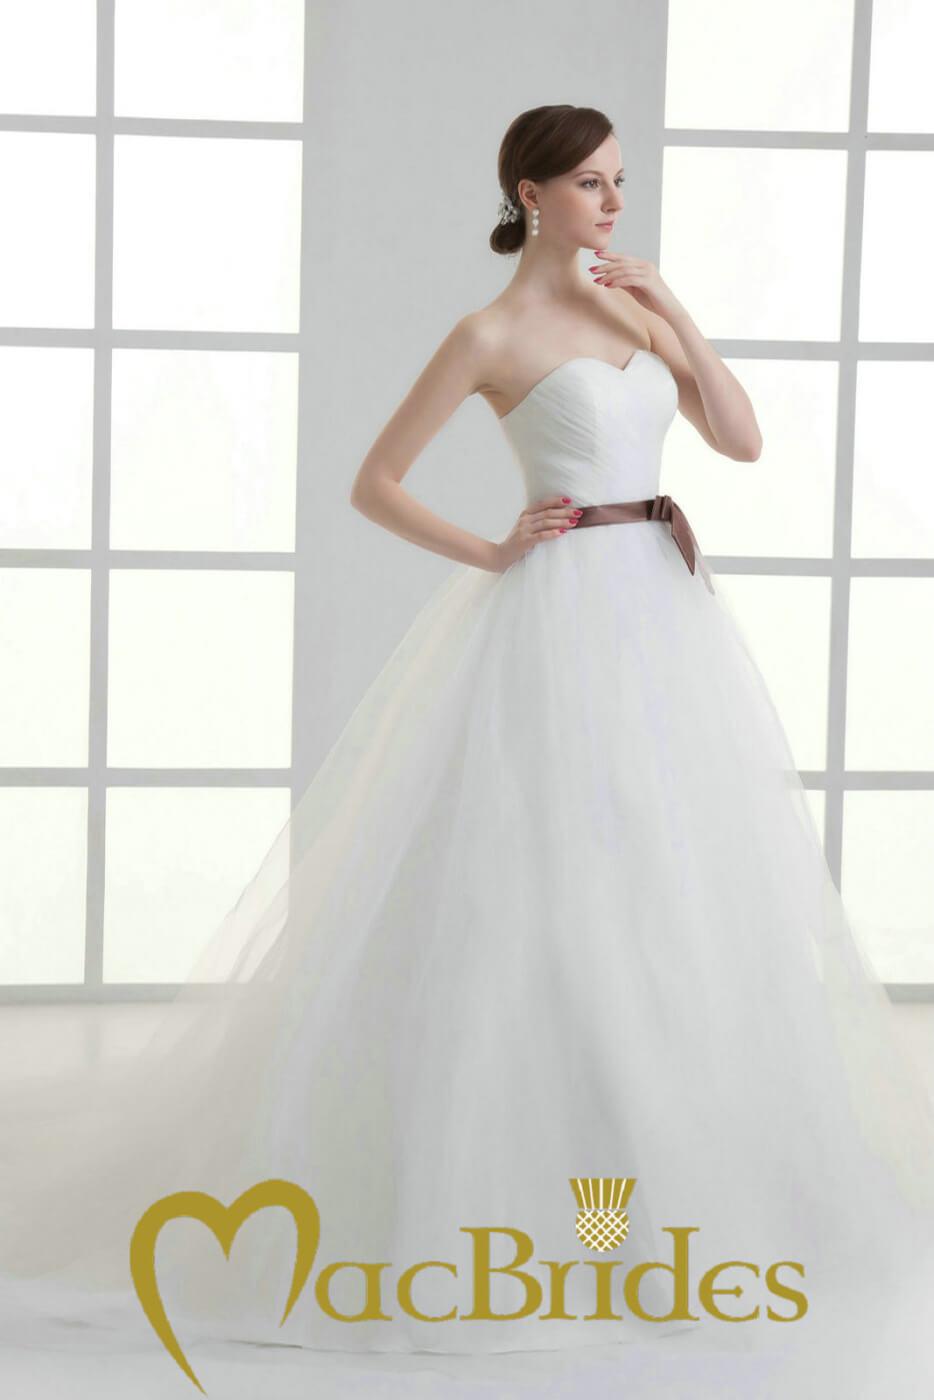 Tallulah Lace | Dresses, Wedding dresses lace, Wedding dresses |Tallulah Wedding Dress